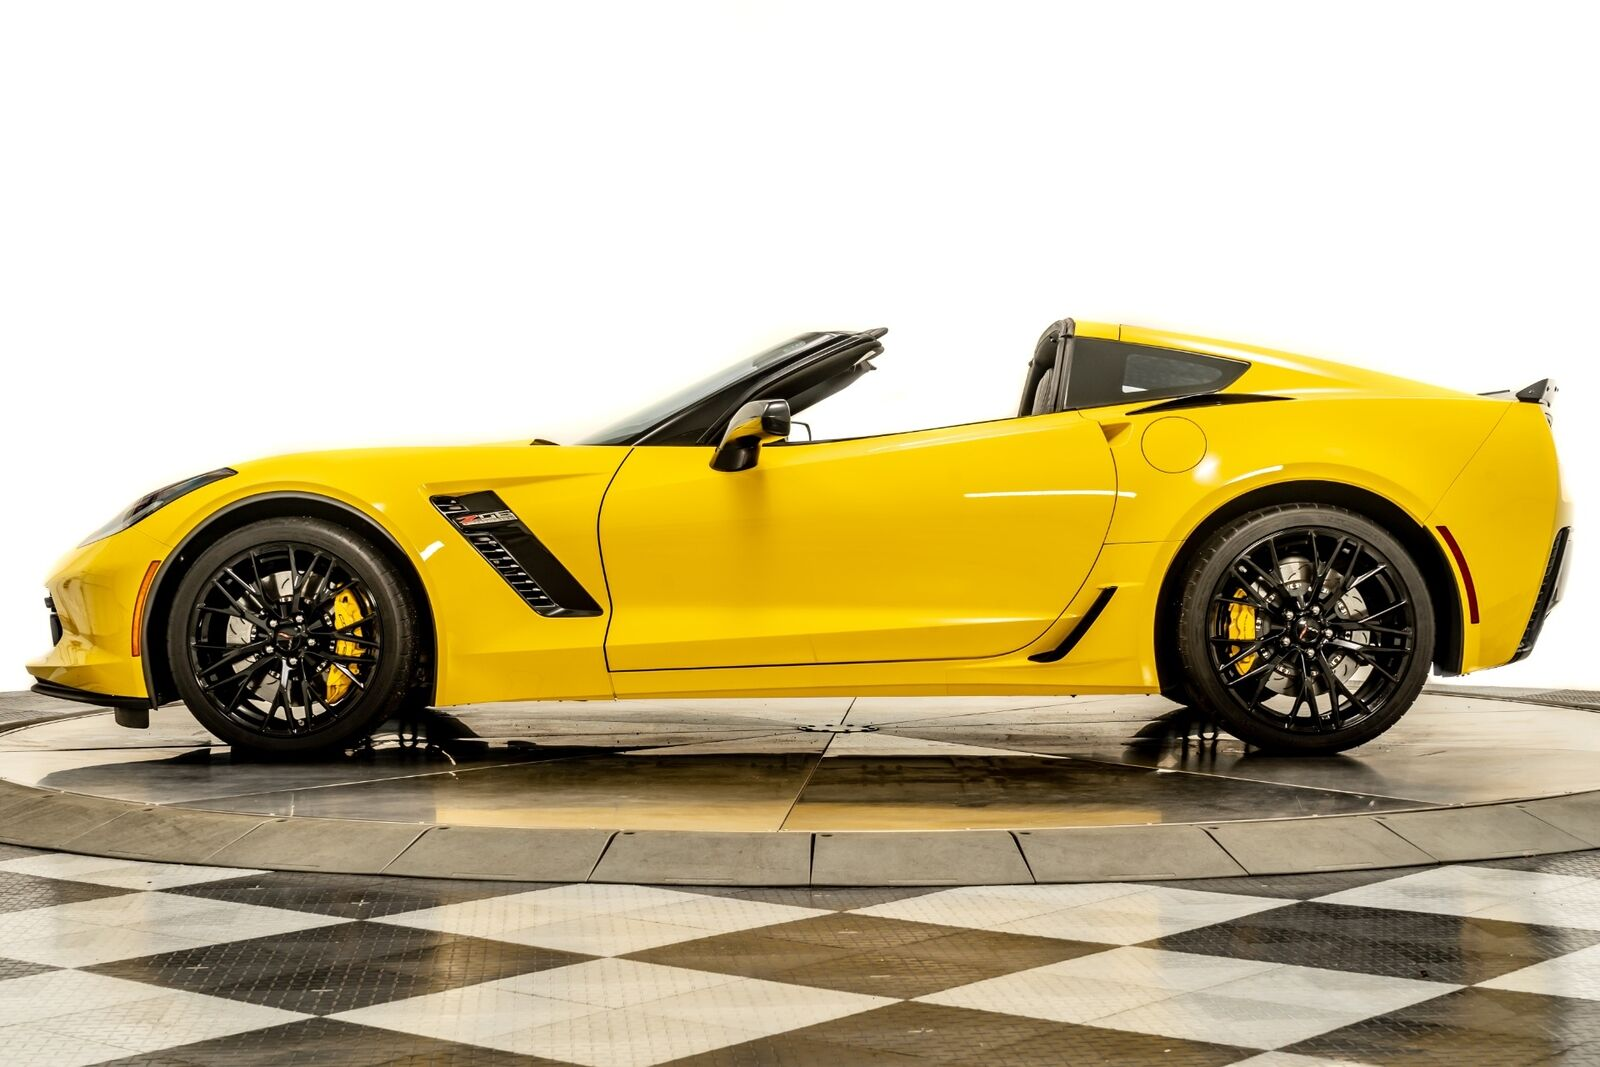 2016 Yellow Chevrolet Corvette Z06  | C7 Corvette Photo 5